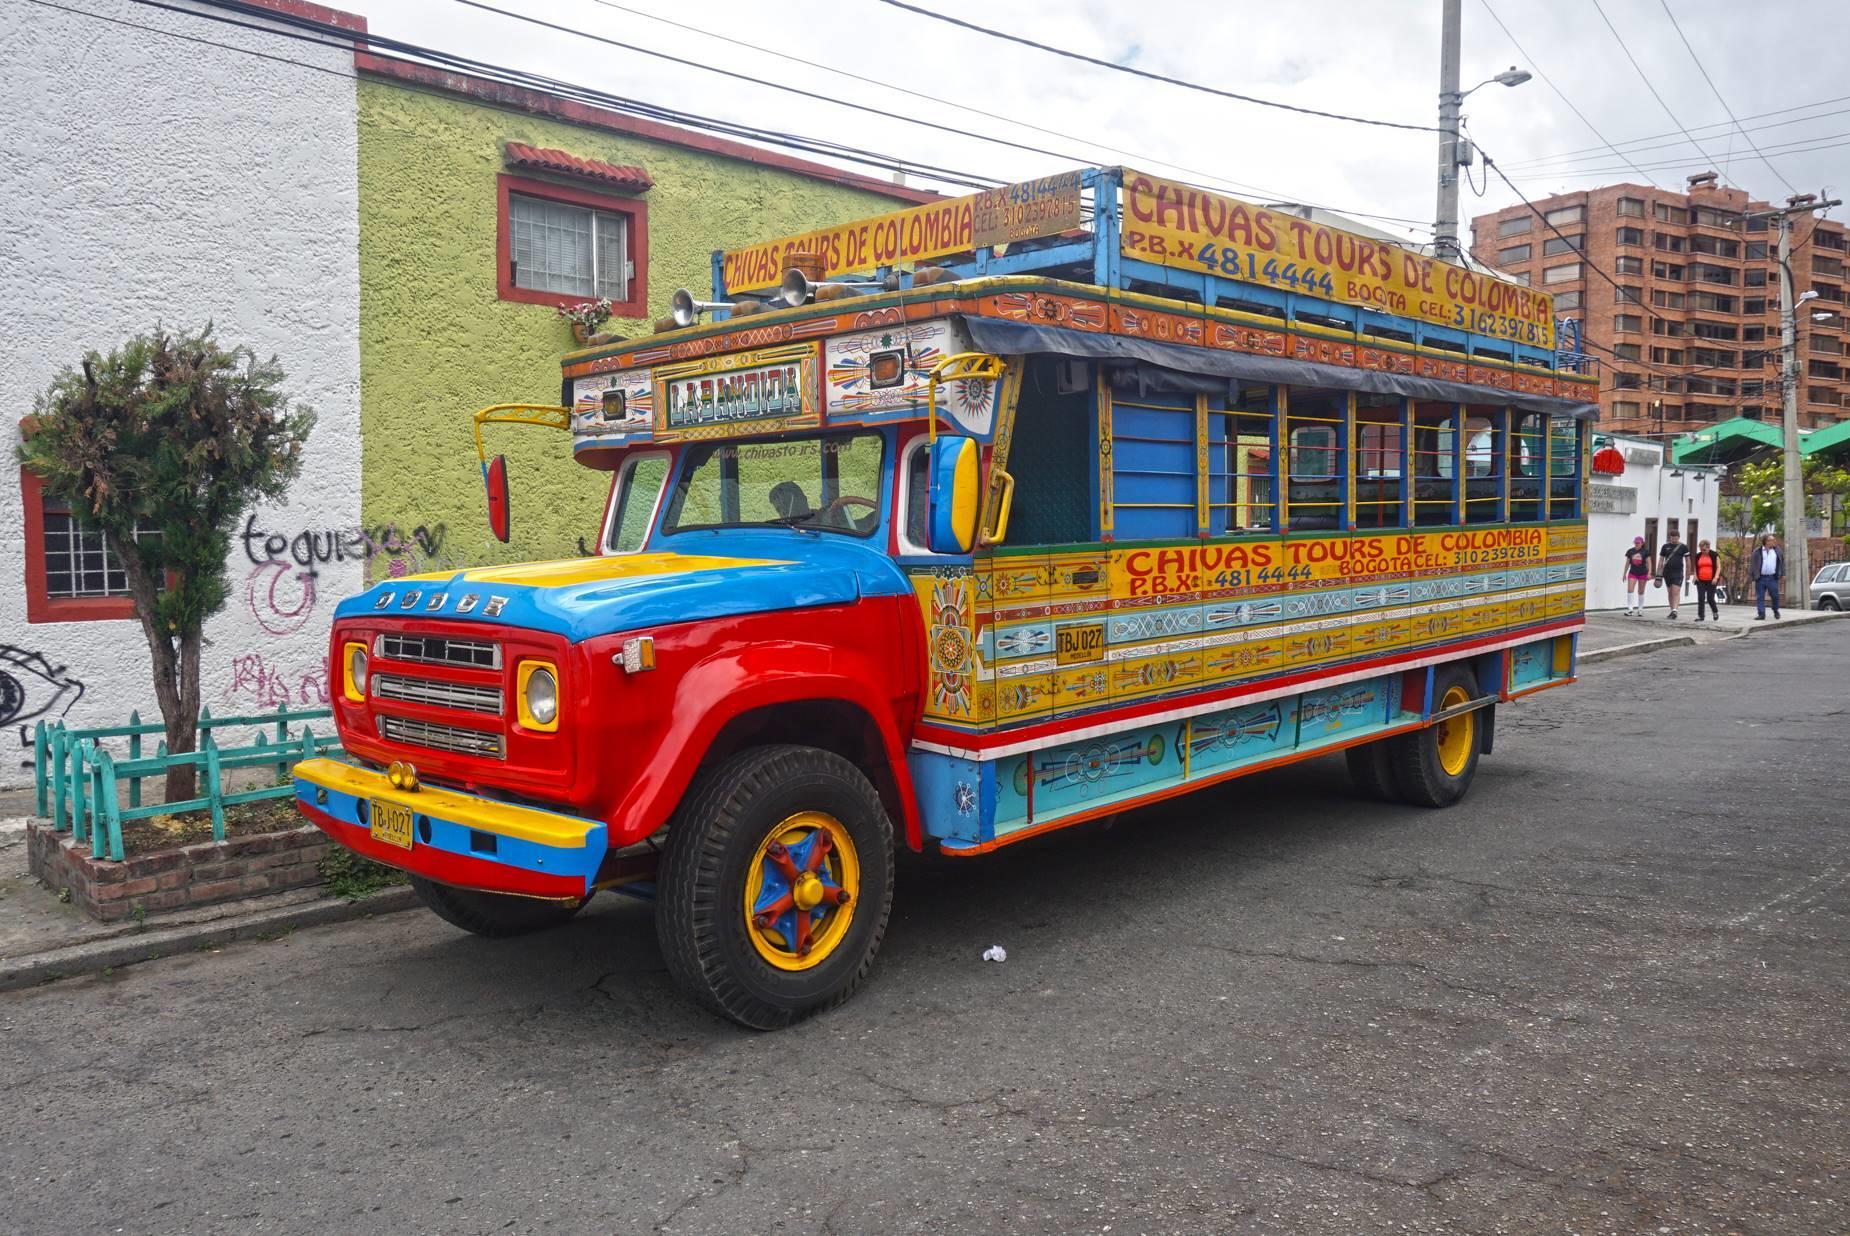 Chiva autobus určený pre turistov, Bogota.